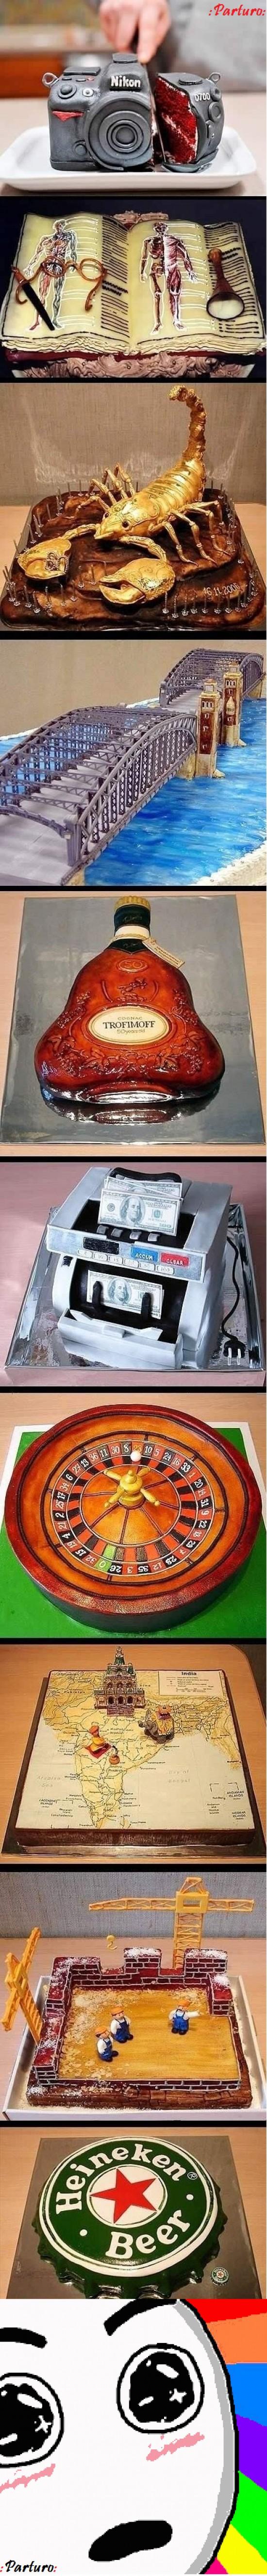 billetes,botella,cakes,escorpion,heinekenruleta,pasteles,puente